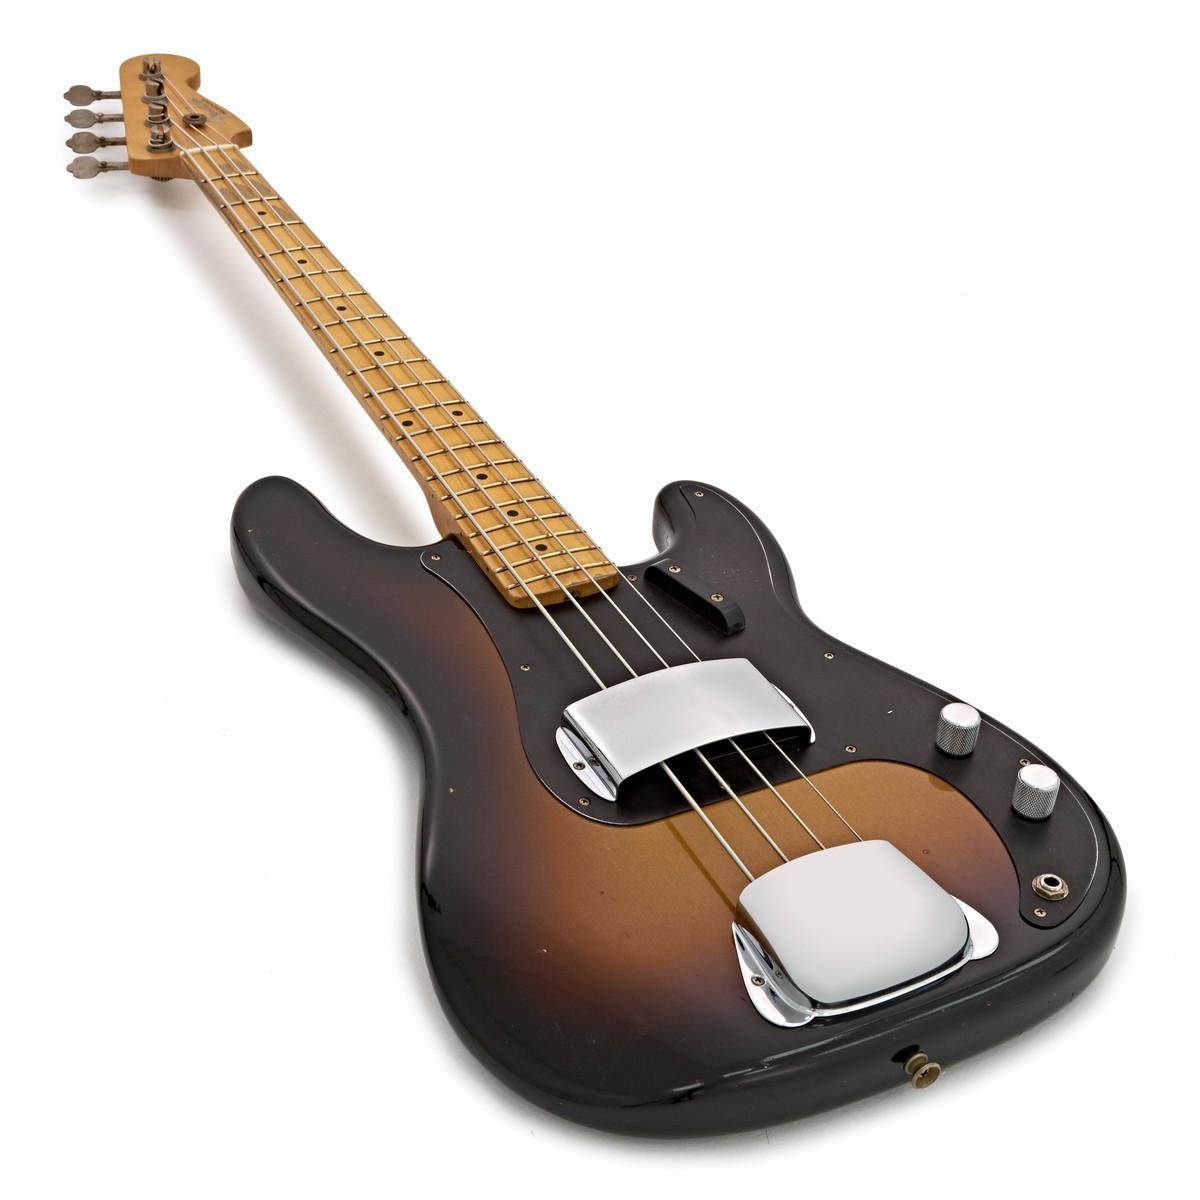 fender custom shop 1958 journeyman relic p bass 2 tone sunburst at gear4music. Black Bedroom Furniture Sets. Home Design Ideas